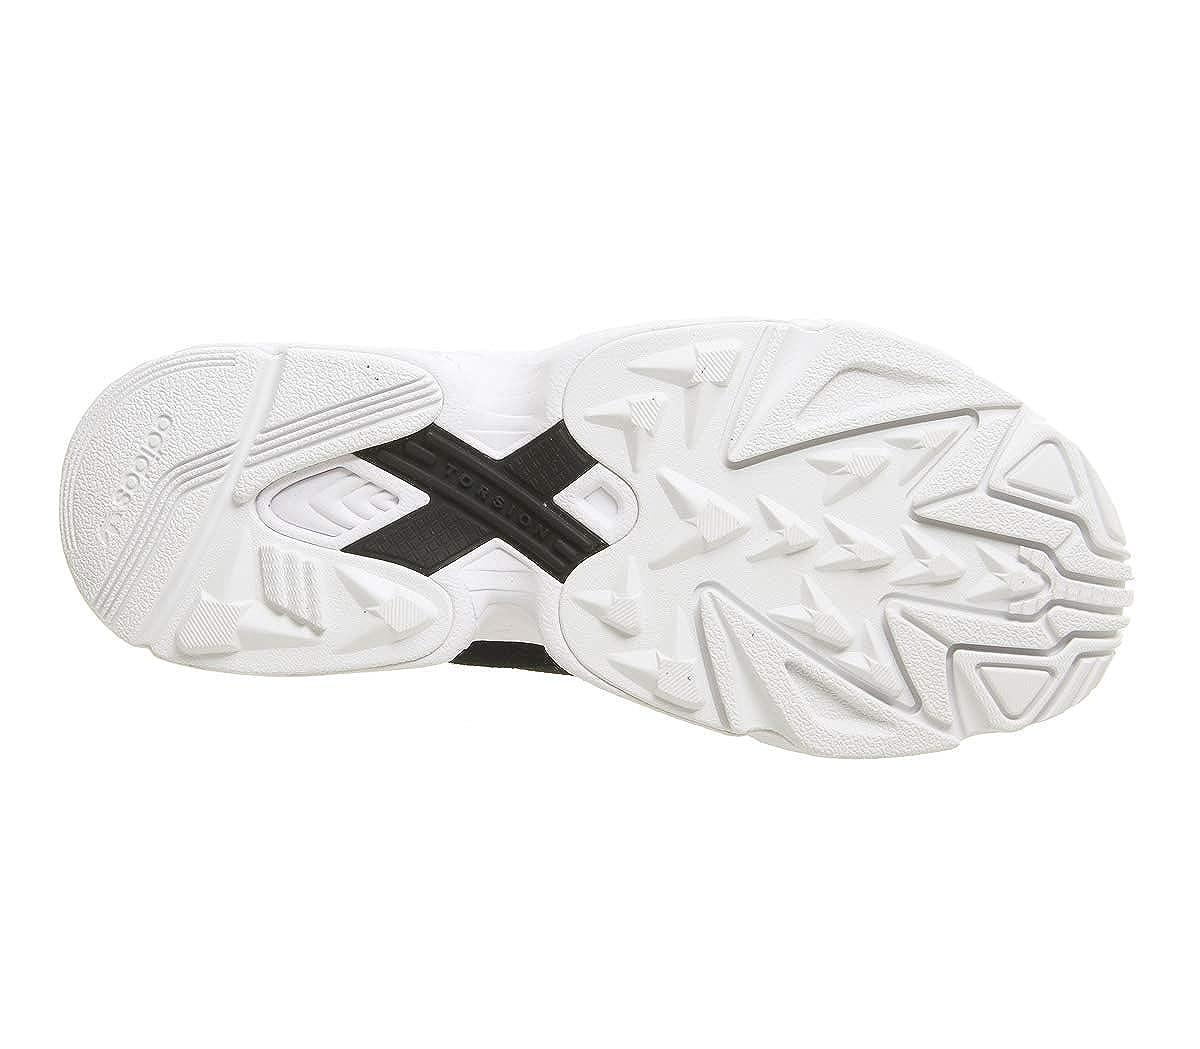 Adidas Adidas Adidas Damen Falcon W Gymnastikschuhe, Mehrfarbig (schwarz Cschwarz/Cschwarz/Ftwwht) e37272